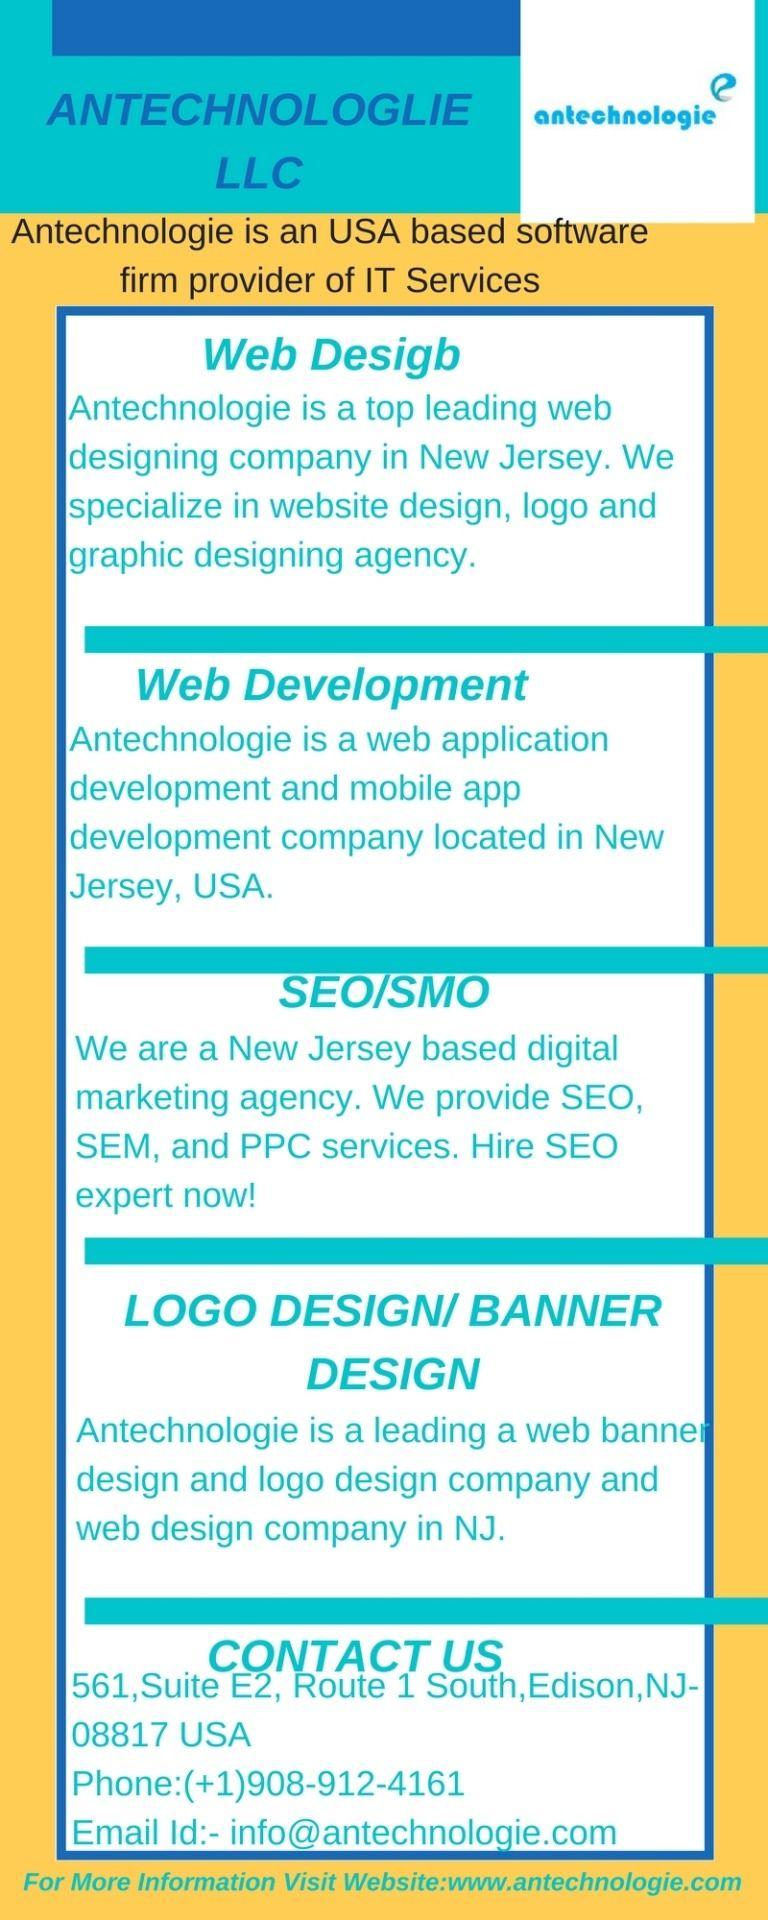 Antechnologie Web Design Responsive Website Design Web Application Development